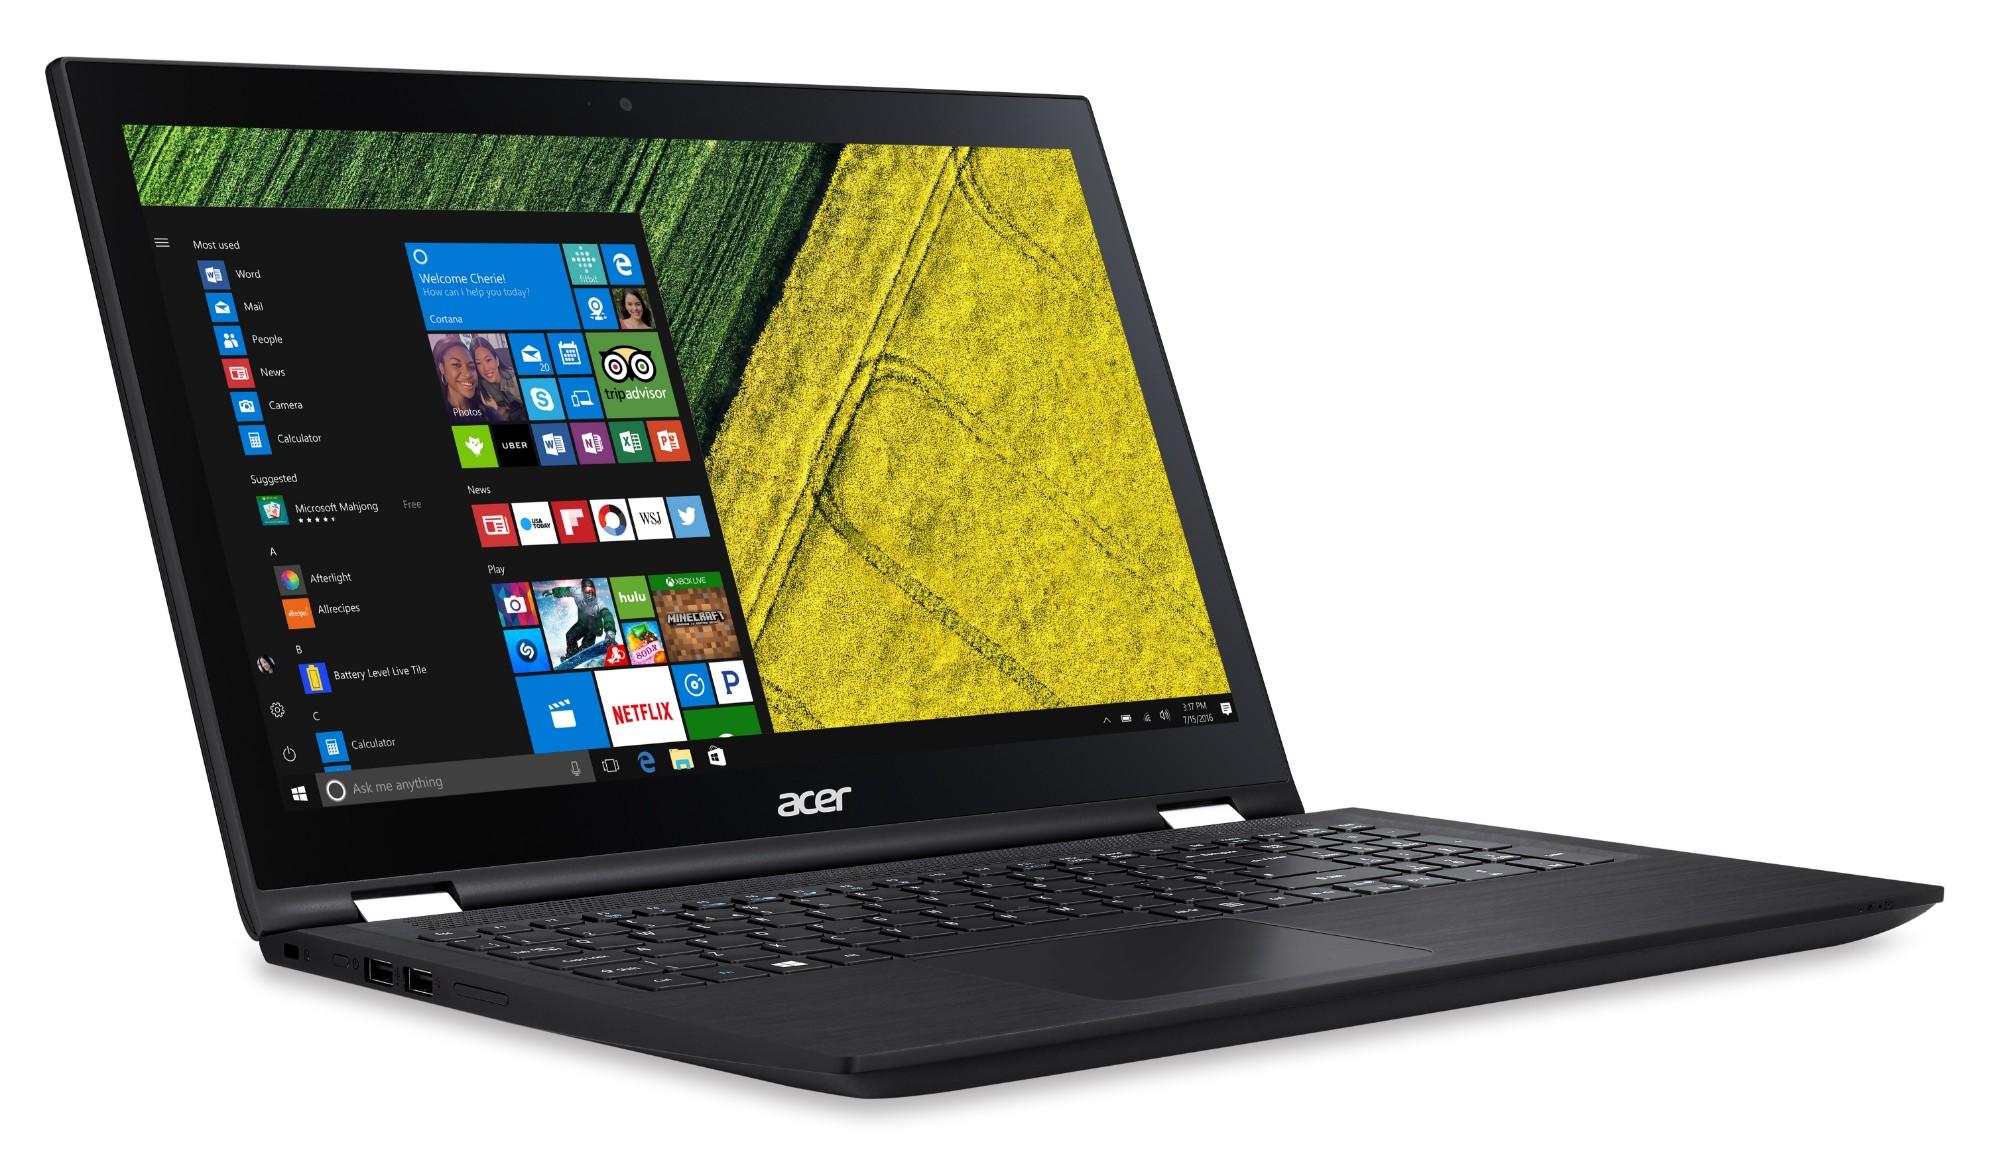 "Laptop Acer SP315-51 intel Ci7, RAM 12GB, Disco Duro 1TB, Pantalla TOUCH 15.6"", Windows 10"